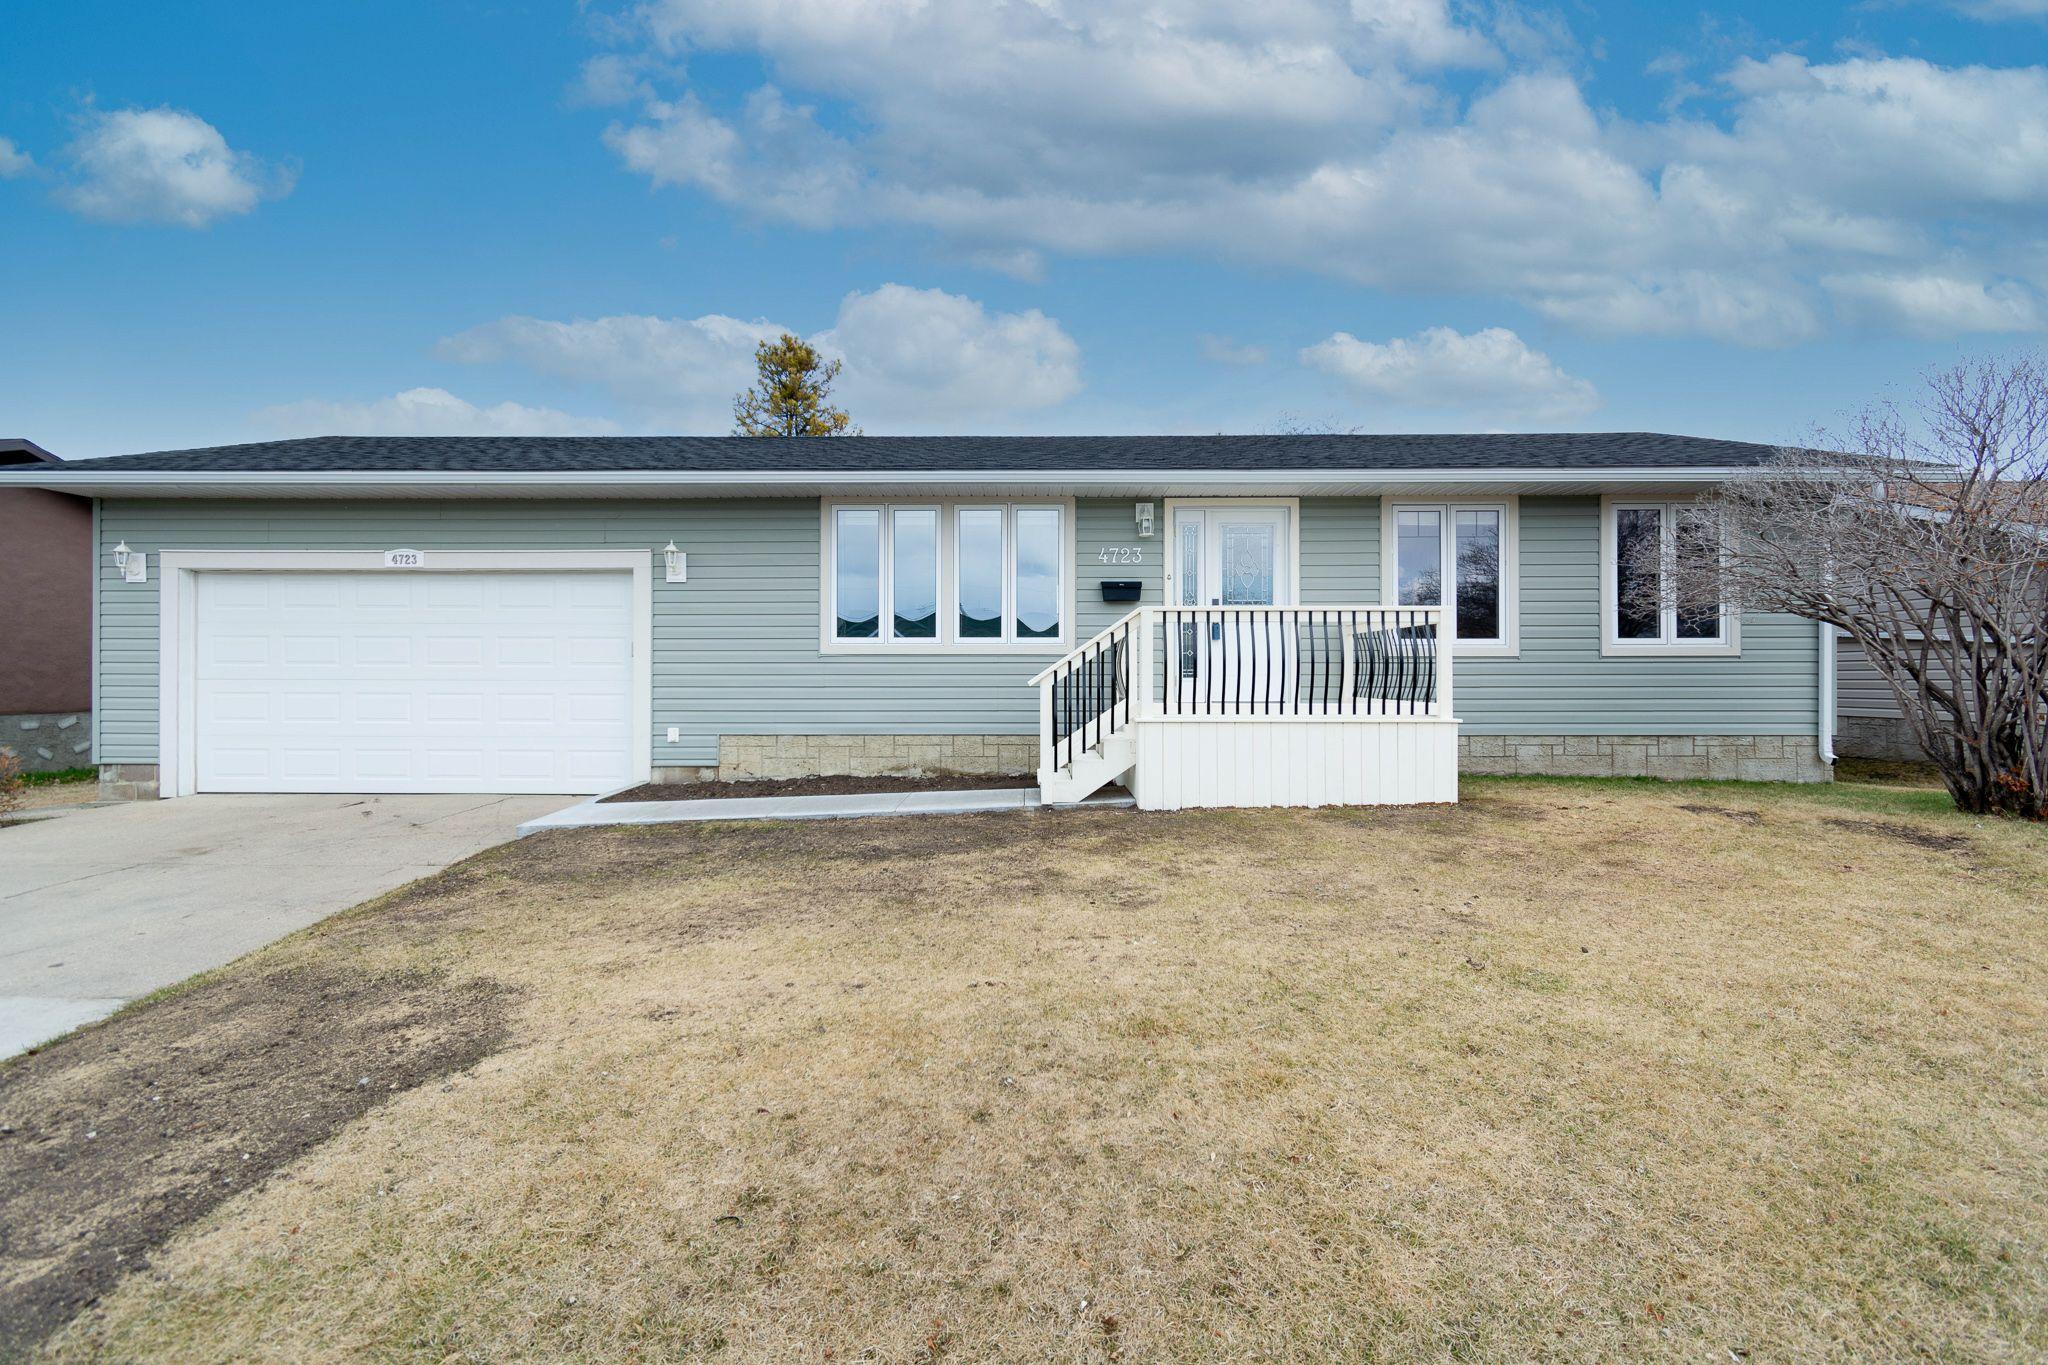 Main Photo: 4723 58 Street: Cold Lake House for sale : MLS®# E4235096